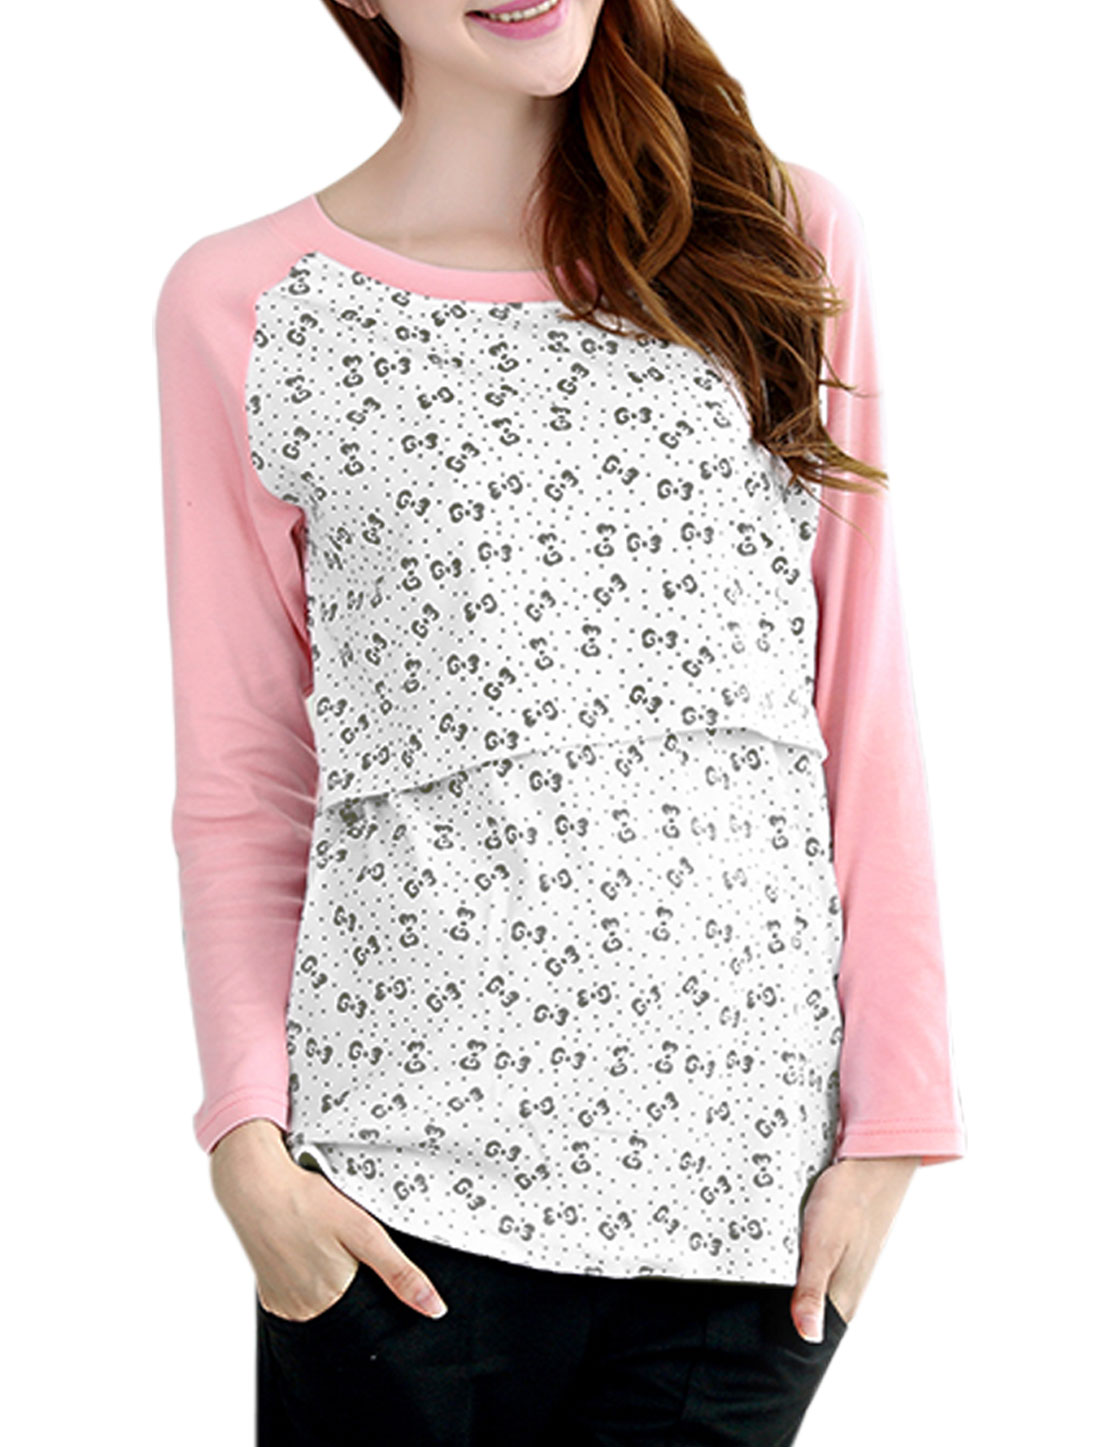 XK166 Motherhood Patched Design Bowknot Pattern Soft T-Shirt Pink White XXL/M (US 10)